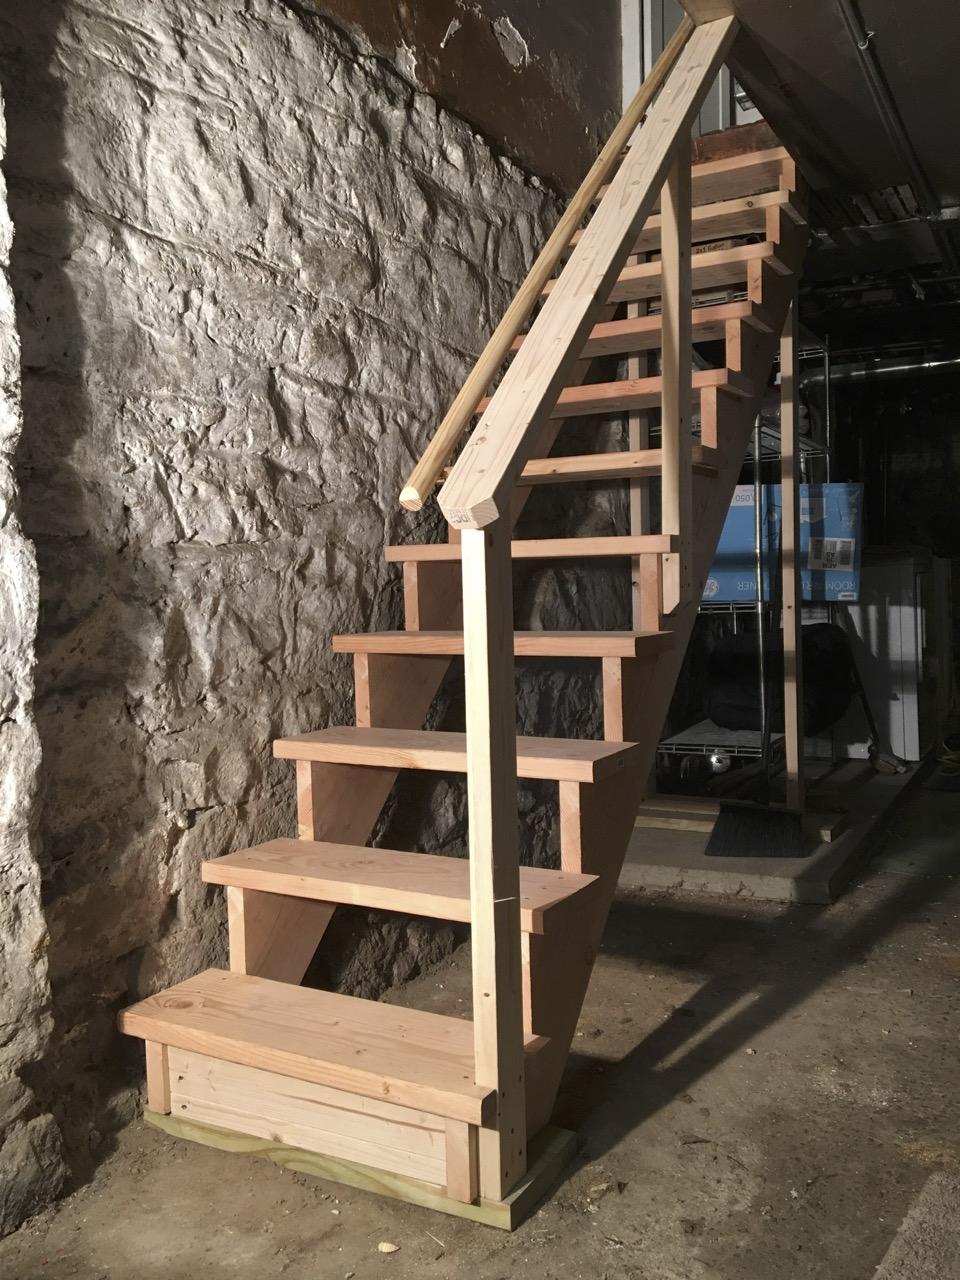 Basement stairs, Brooklyn, NY